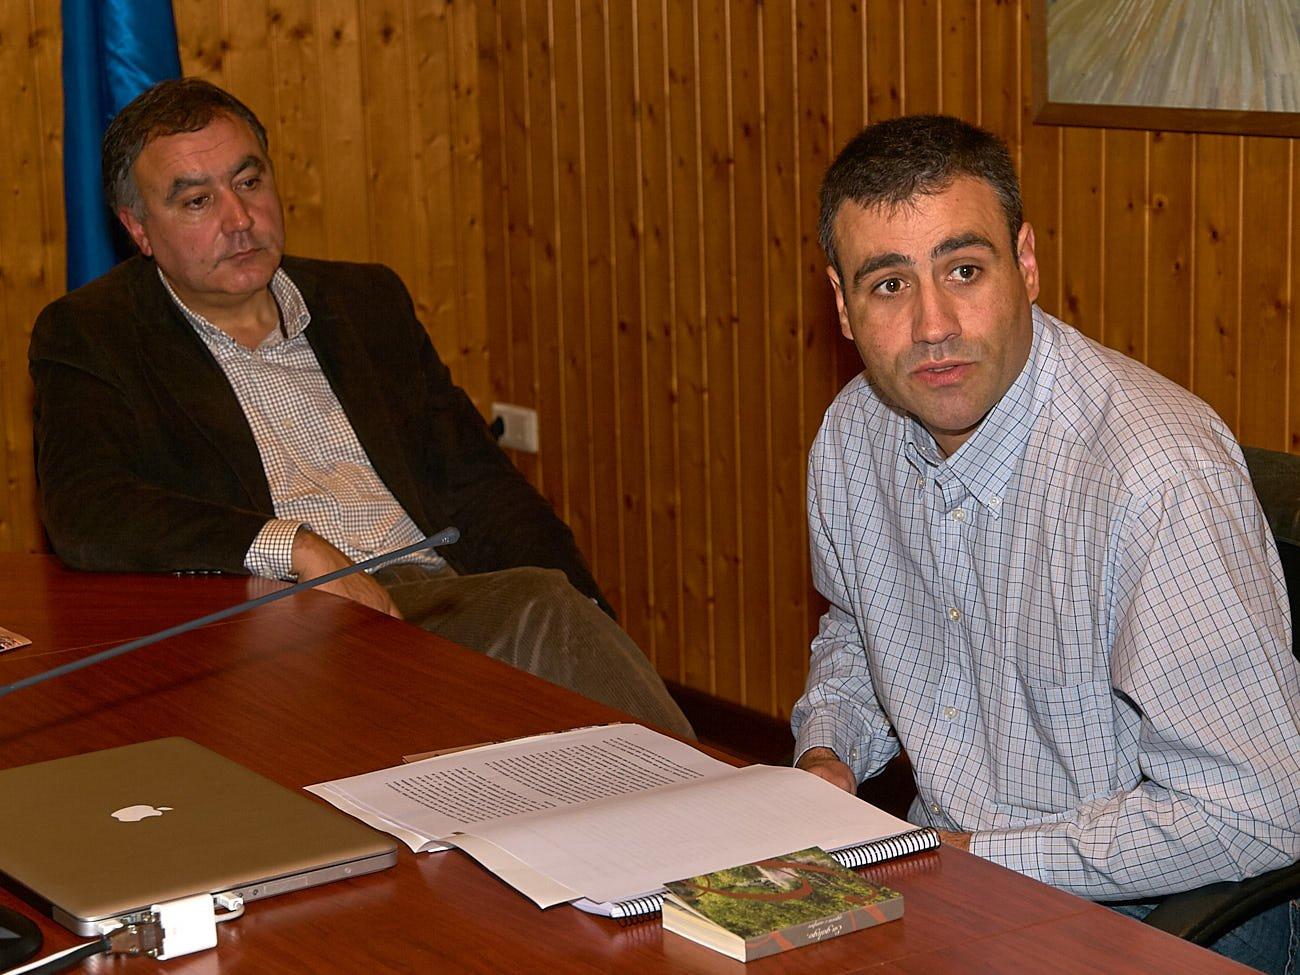 Seminario sobre o patrimonio cultural de Galicia